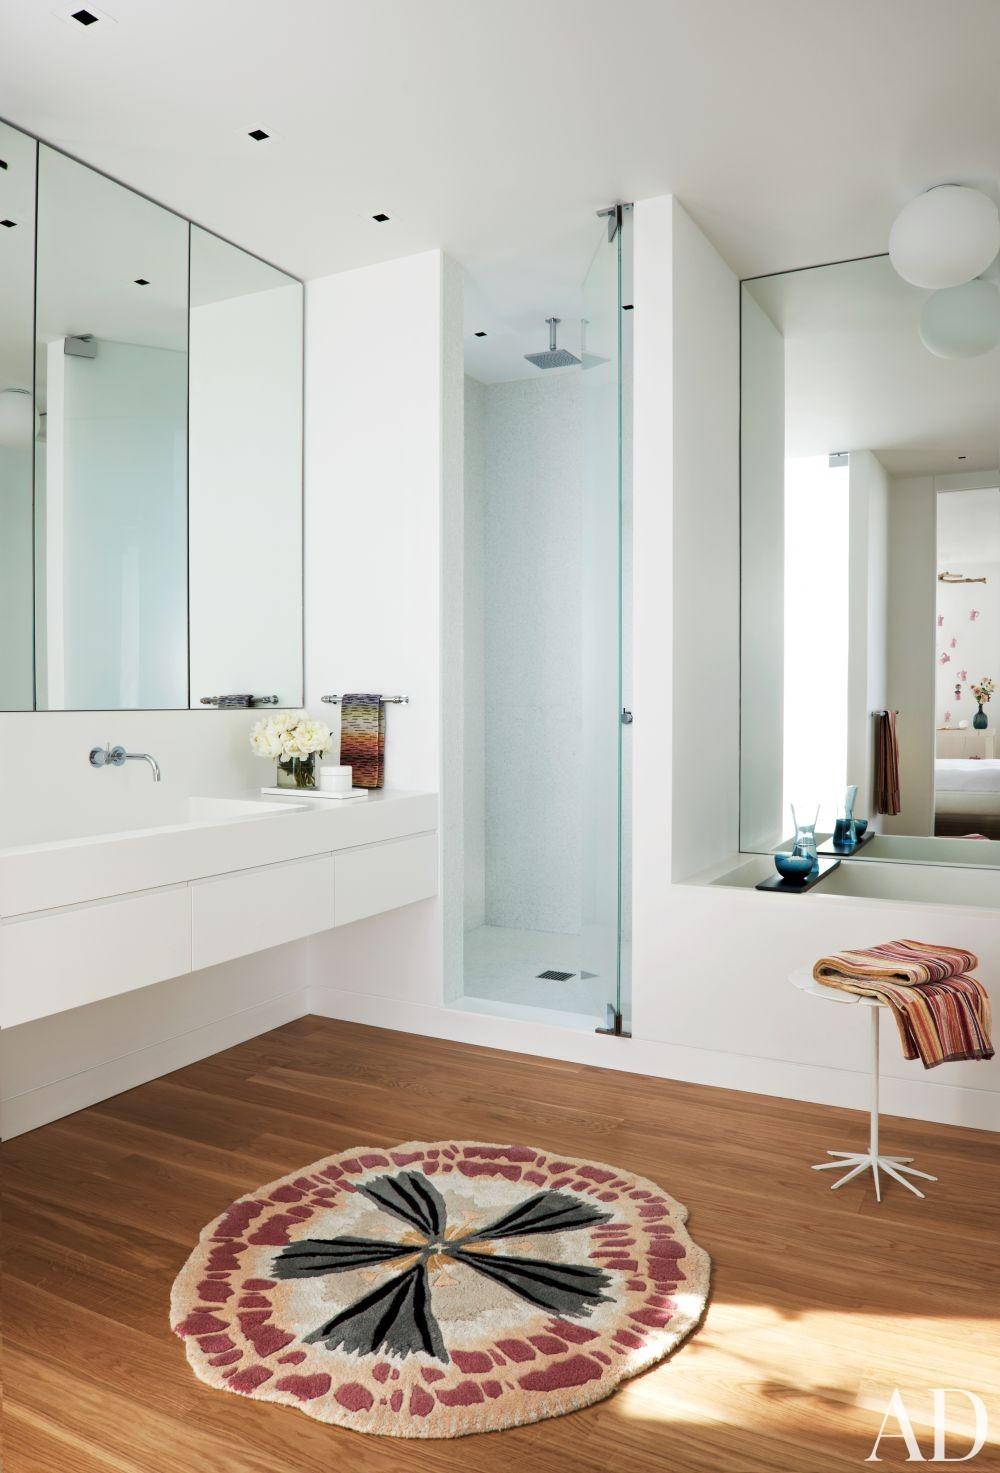 Modern Bathroom by Kallos Turin in Carpinteria, California